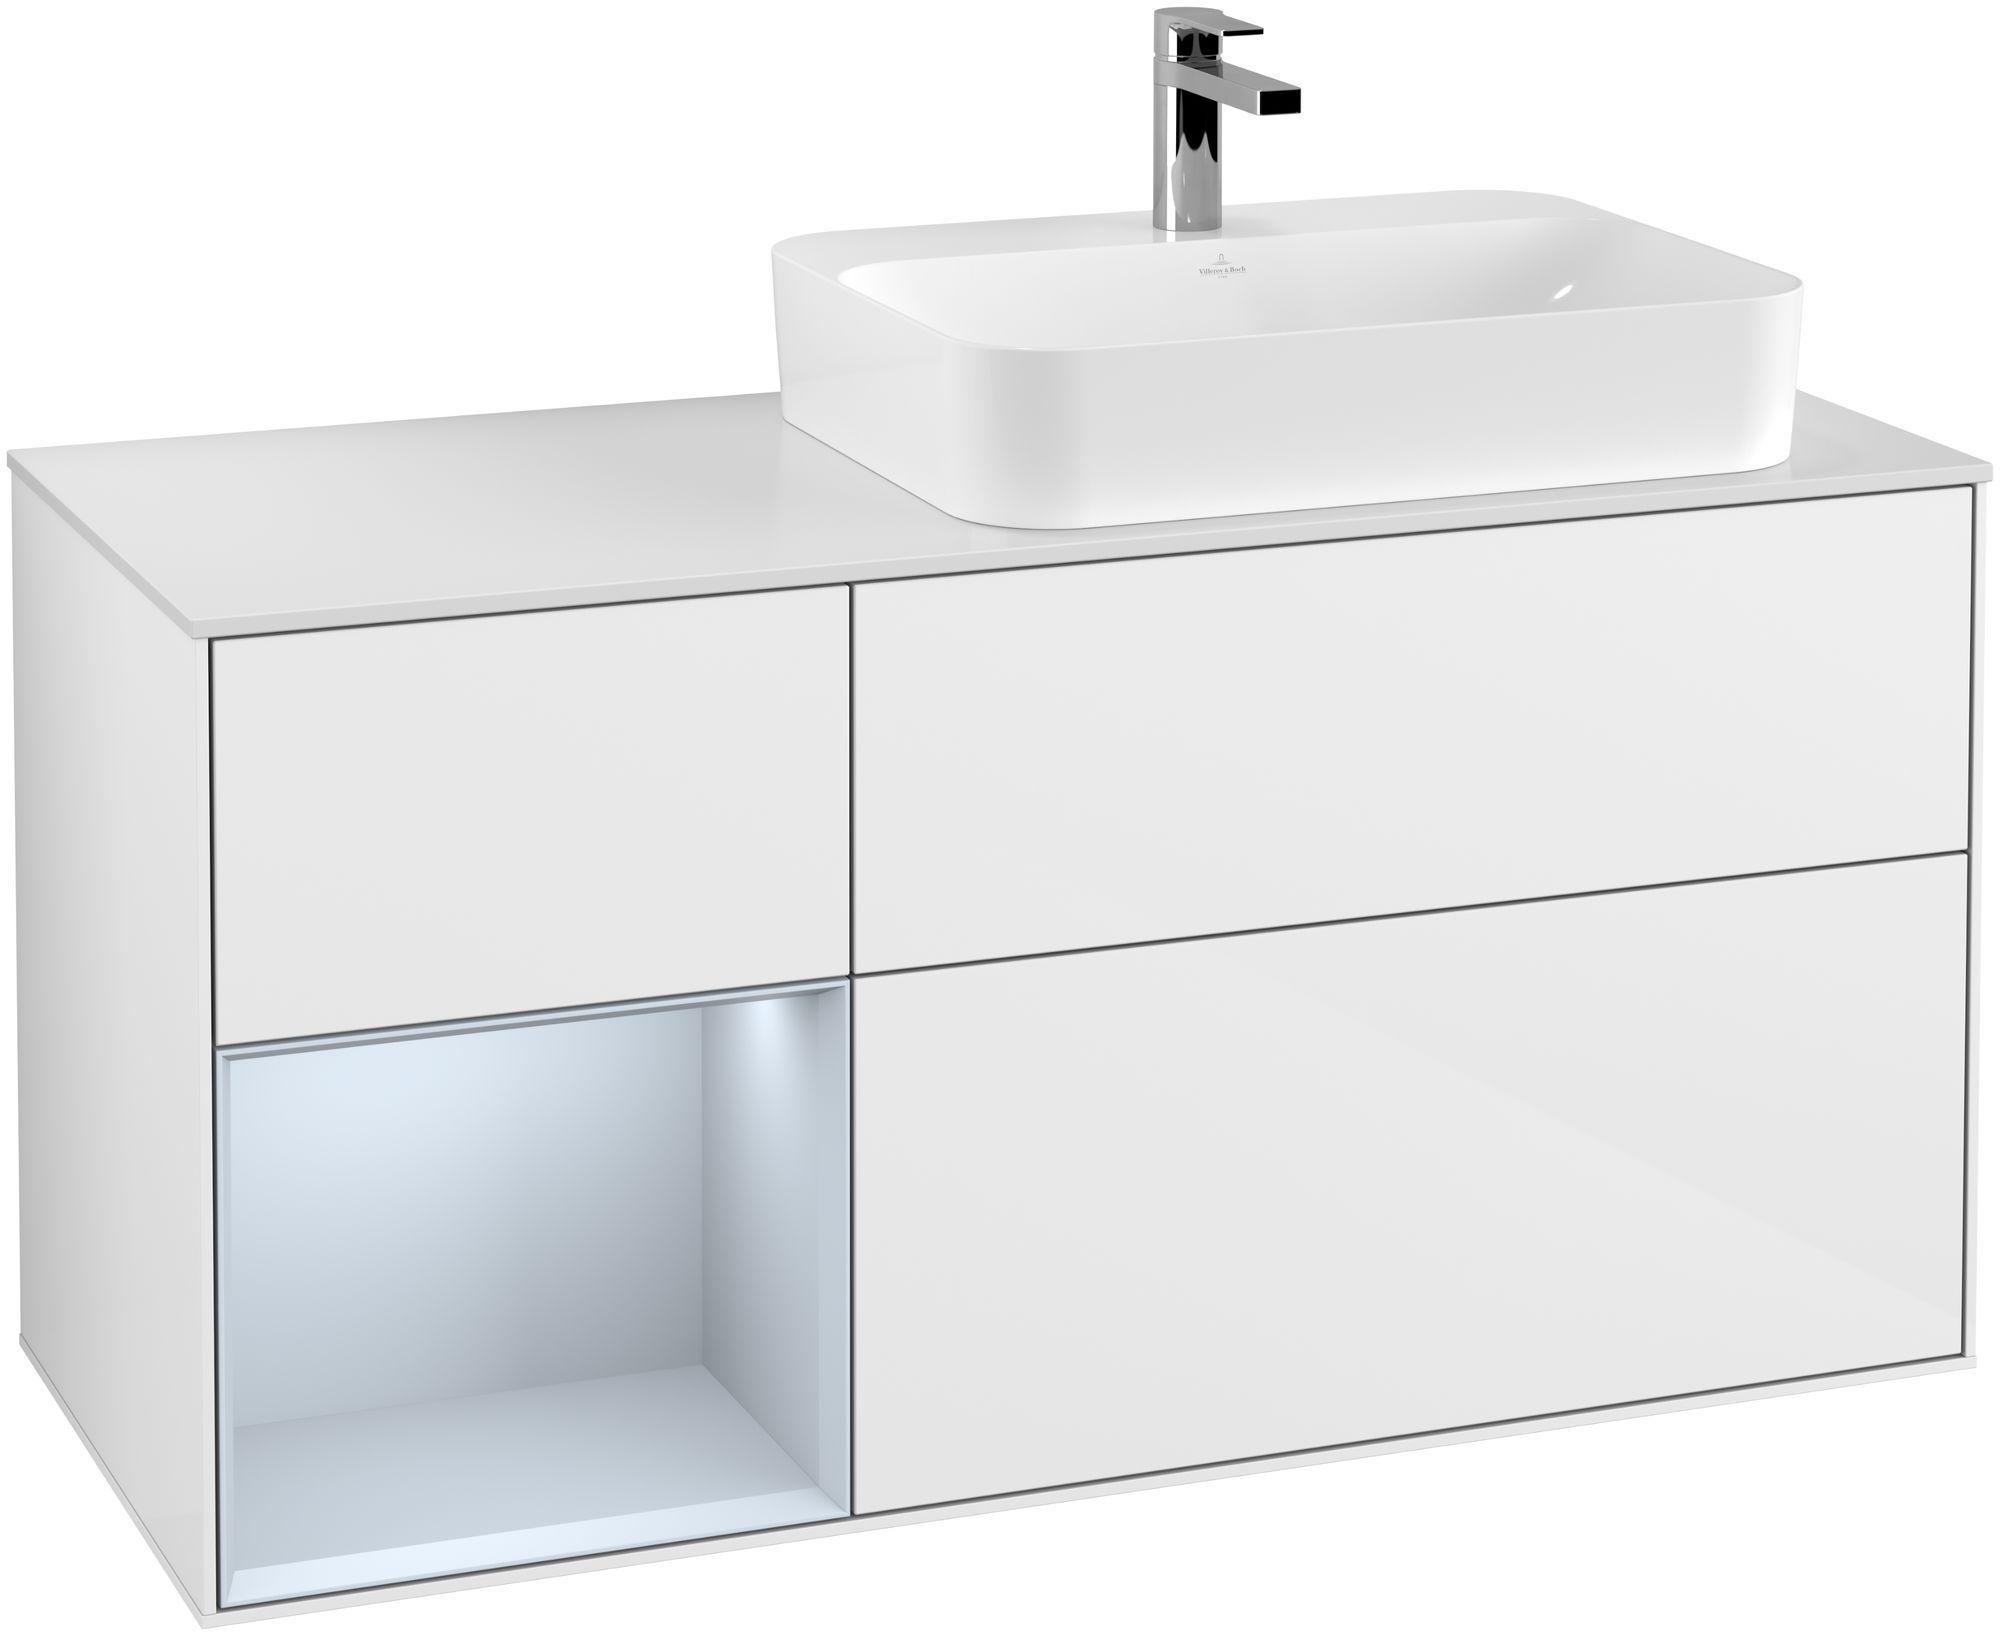 Villeroy & Boch Finion F39 Waschtischunterschrank mit Regalelement 3 Auszüge Waschtisch rechts LED-Beleuchtung B:120xH:60,3xT:50,1cm Front, Korpus: Glossy White Lack, Regal: Cloud, Glasplatte: White Matt F391HAGF